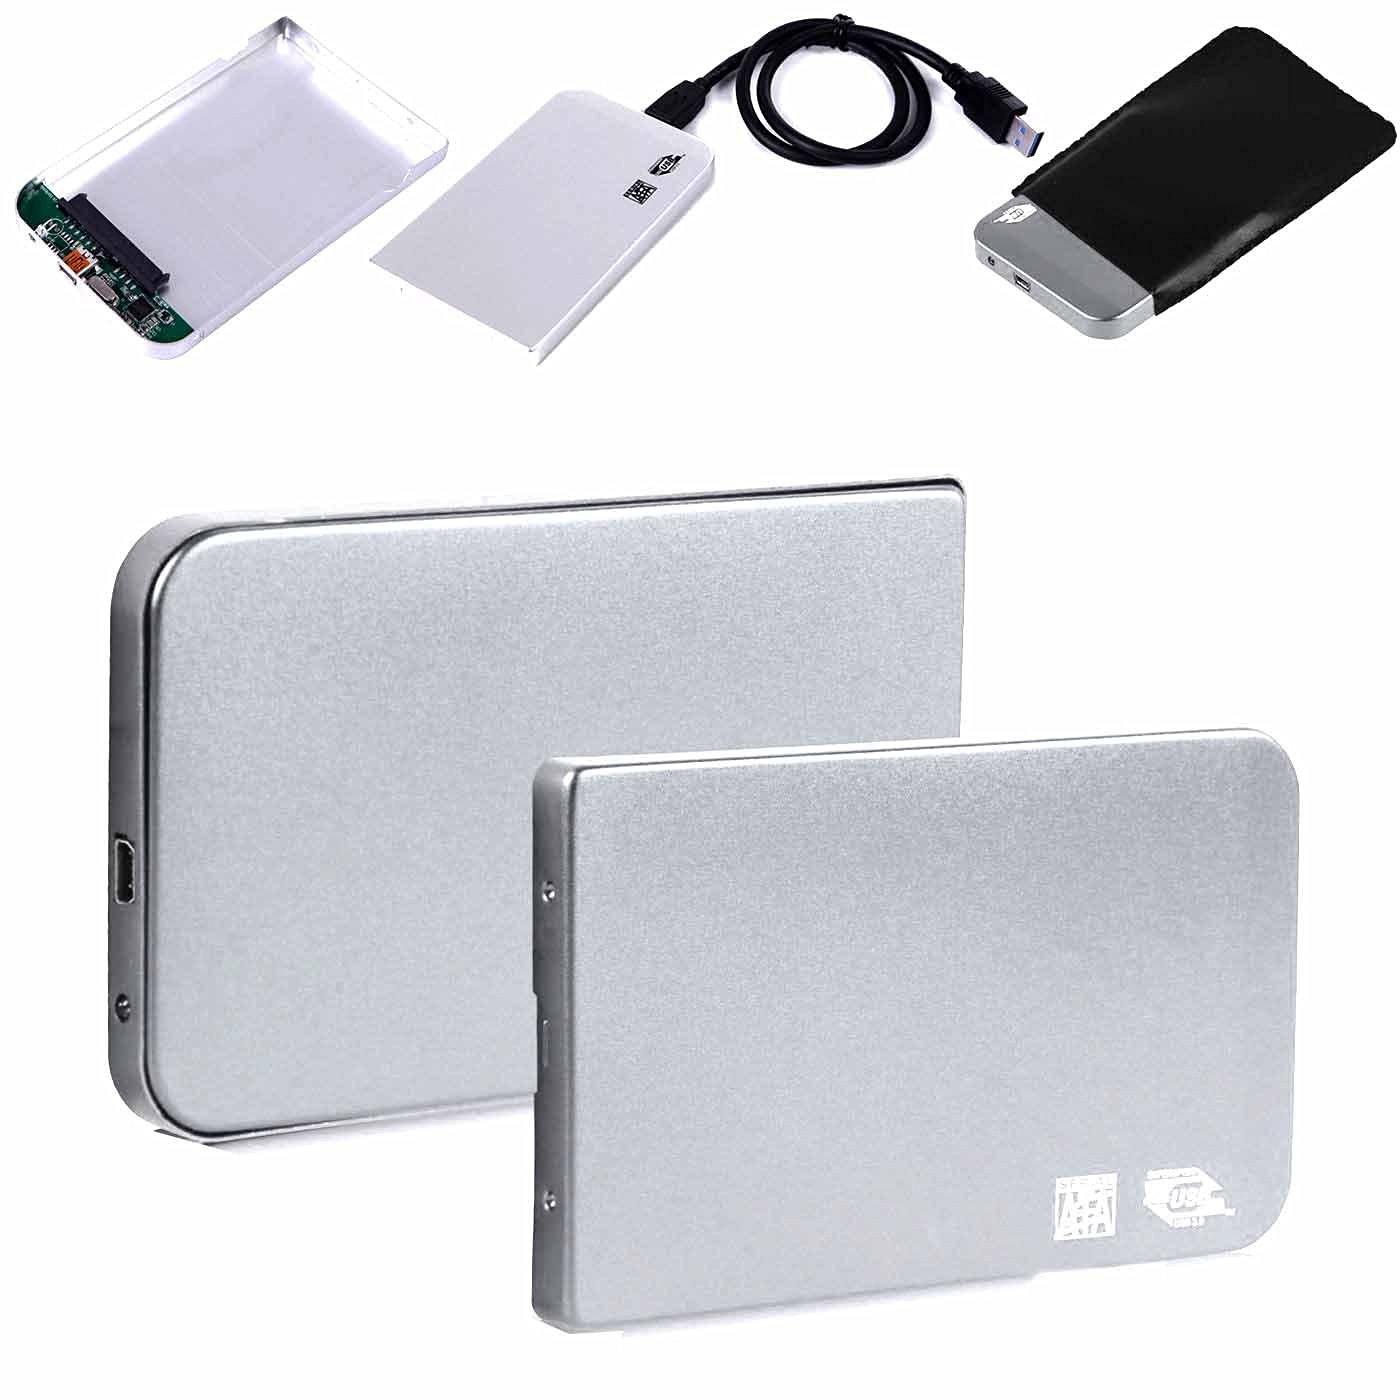 "Simply Silver - Aluminium 2.5"" USB 3.0 SATA HDD Hard Drive Disk External Case Enclosure Silver - Unbranded"